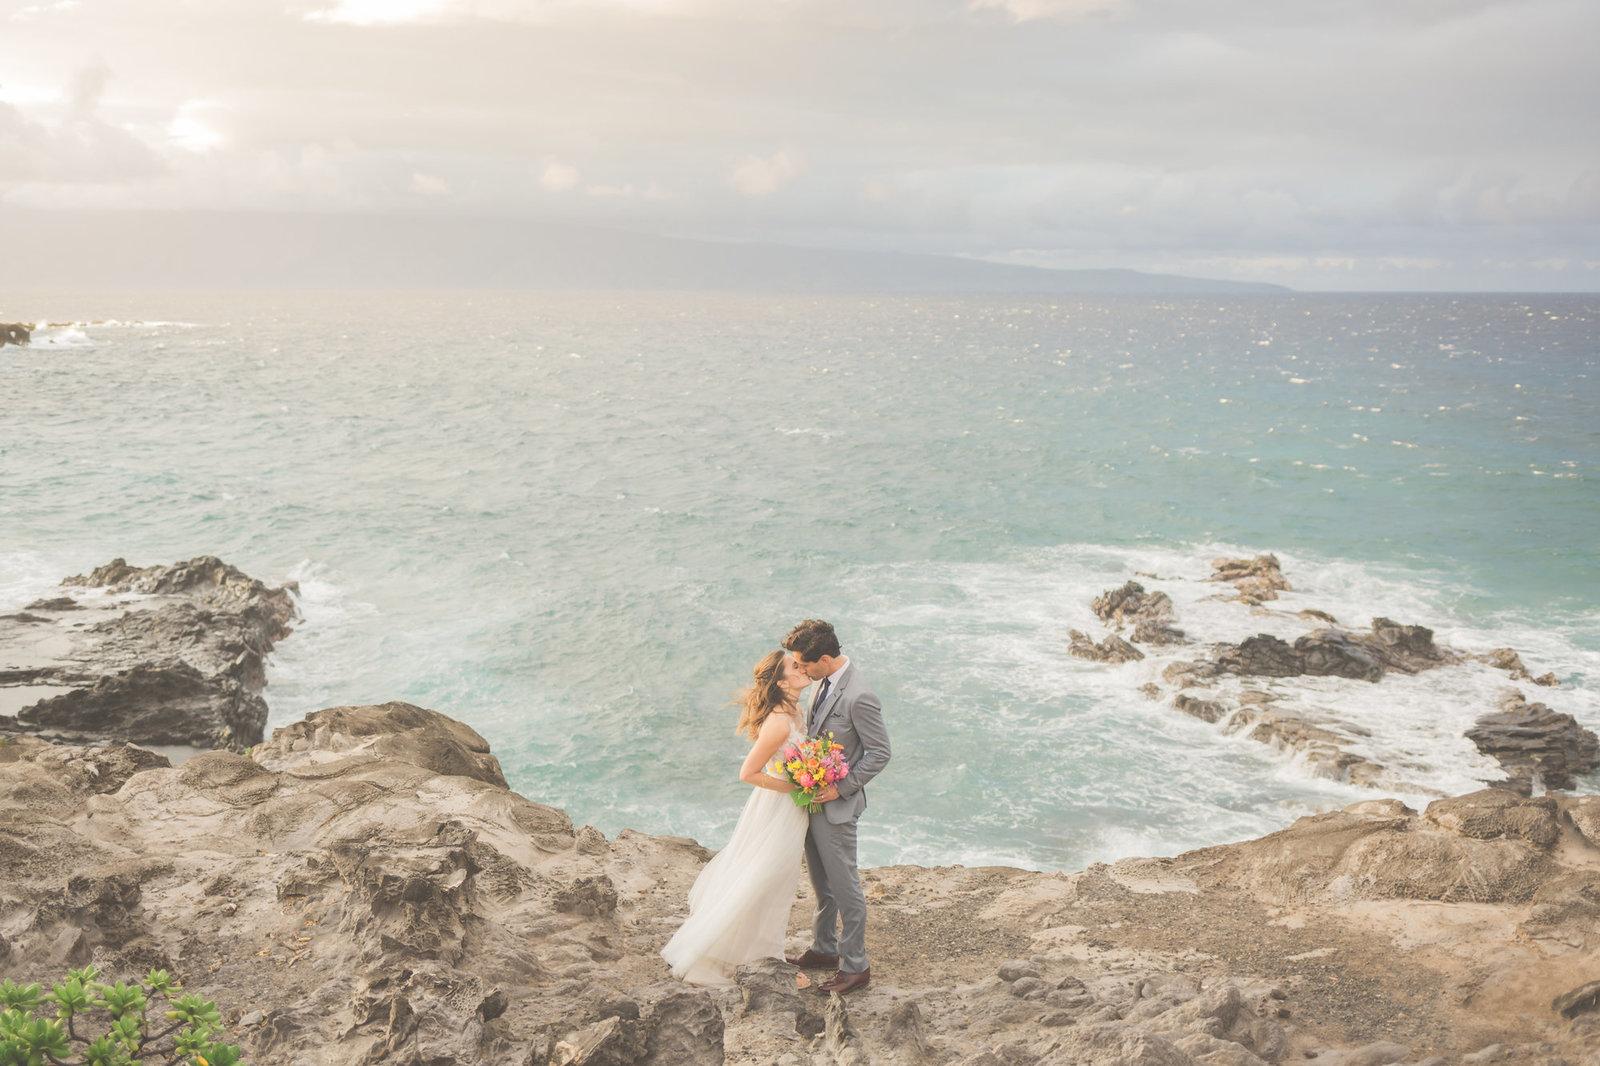 Maui wedding photographer reviews Wailea Photography @ Maui Photographer Wedding